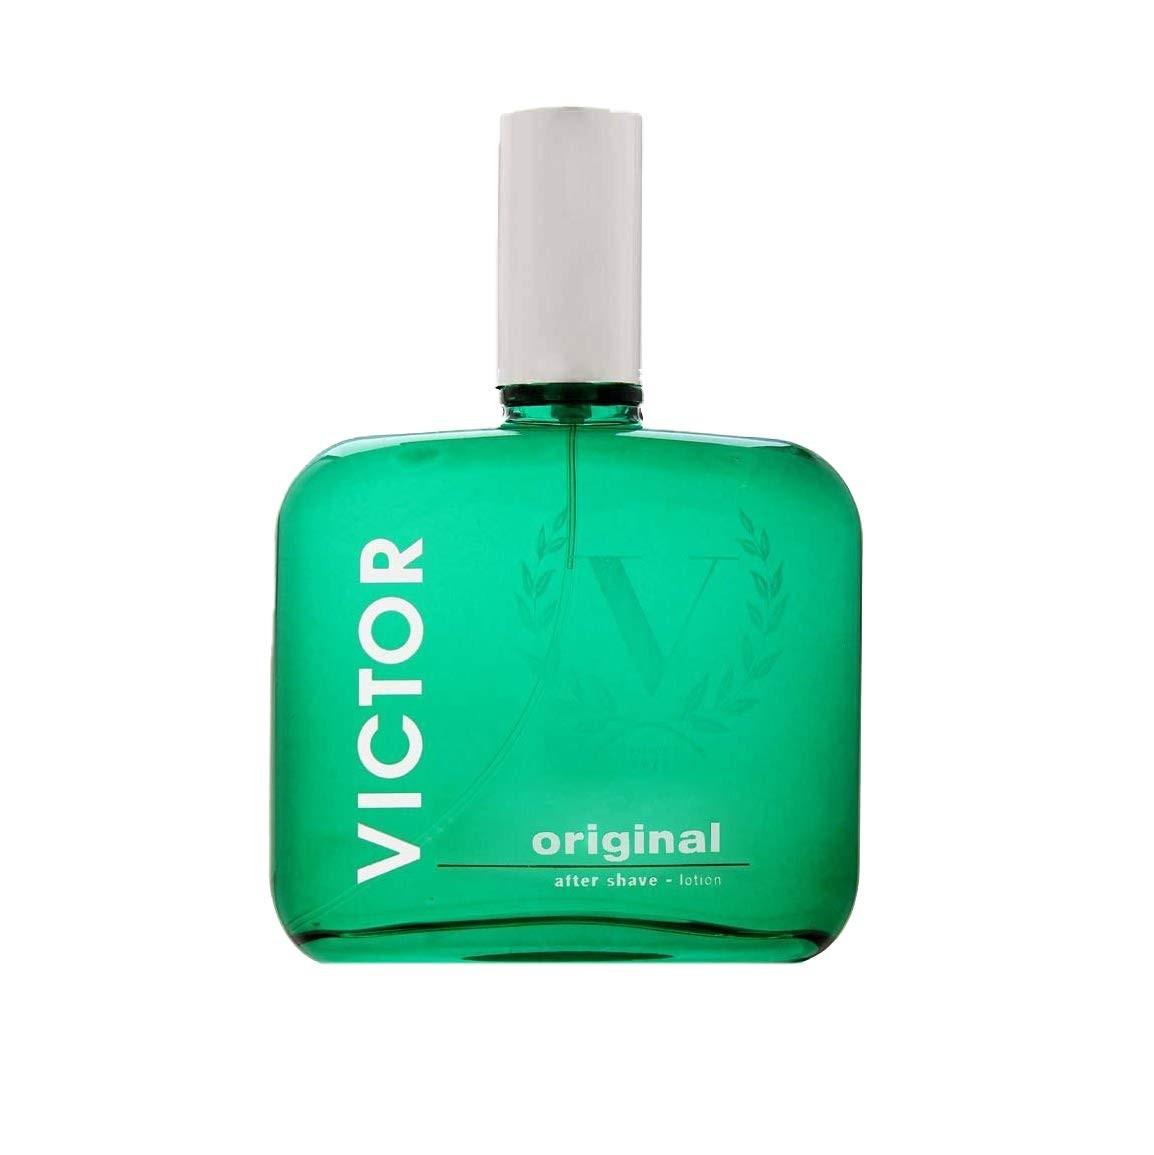 Victor Original by Parfums Victor for Men 3.4 oz After Shave Pour